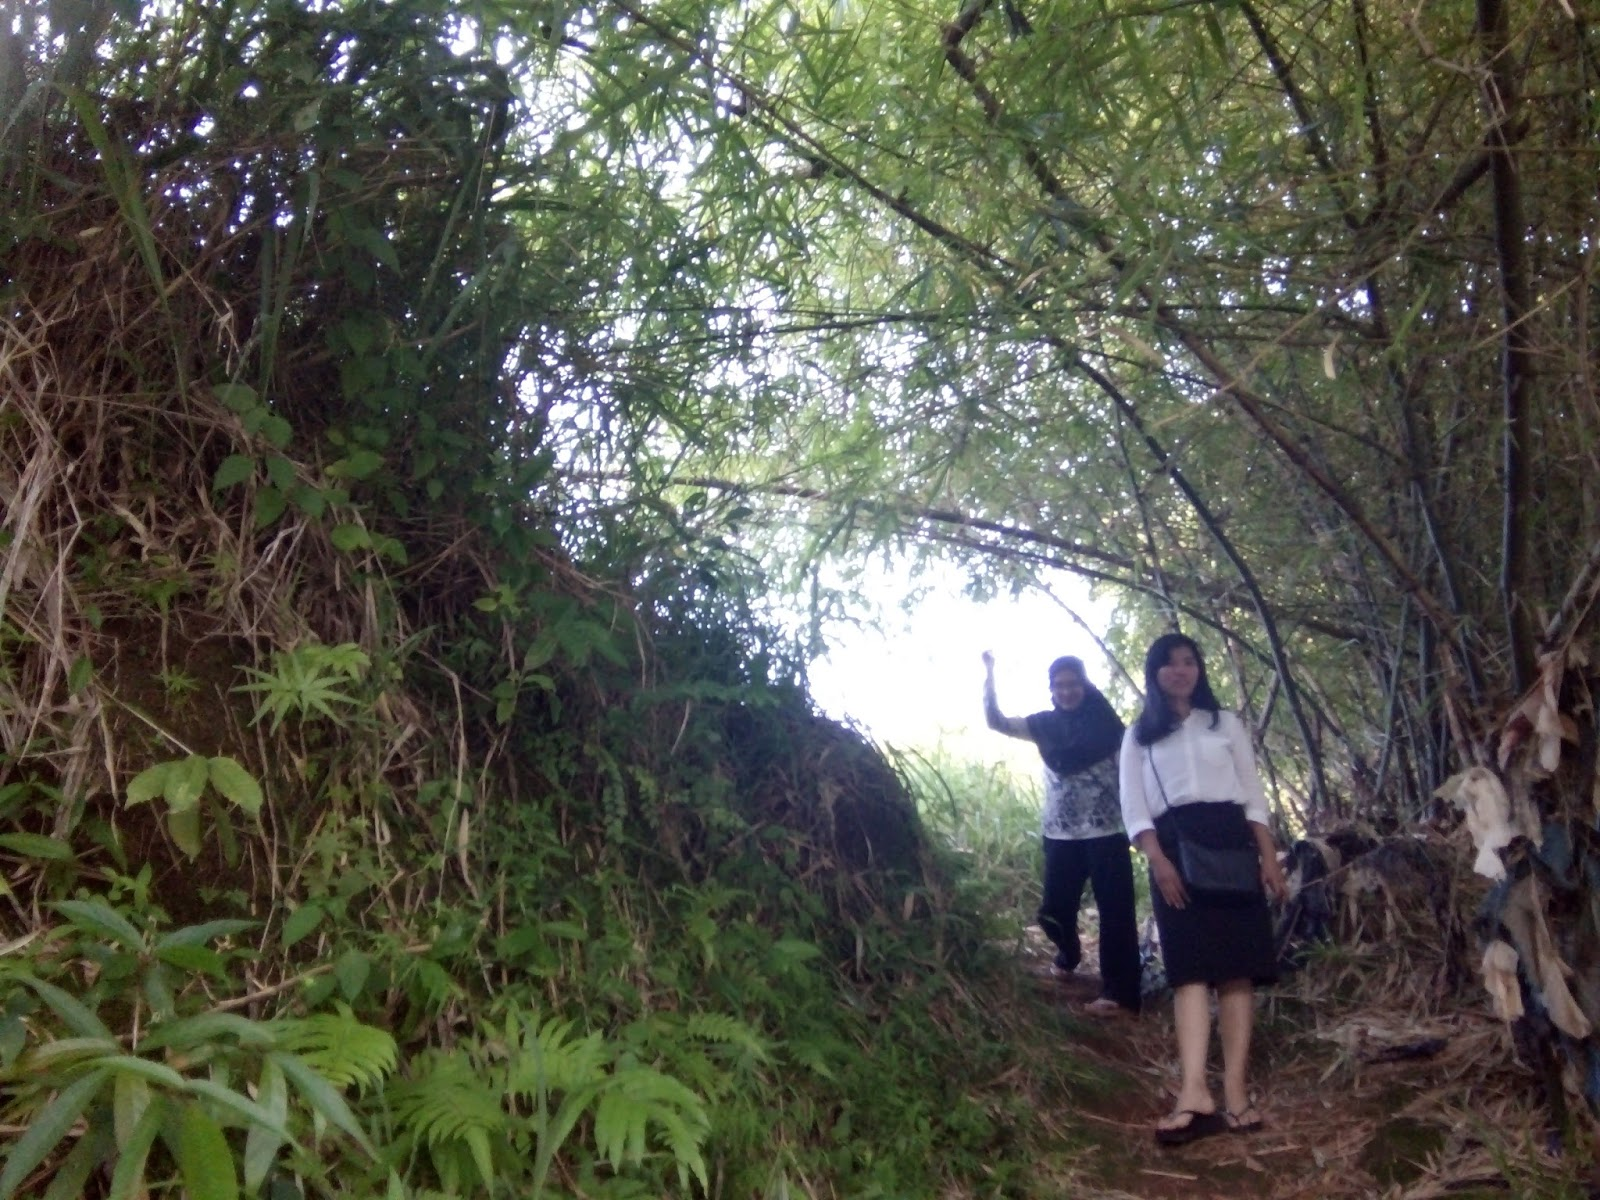 Wisata Alam Kranggan Bekasi